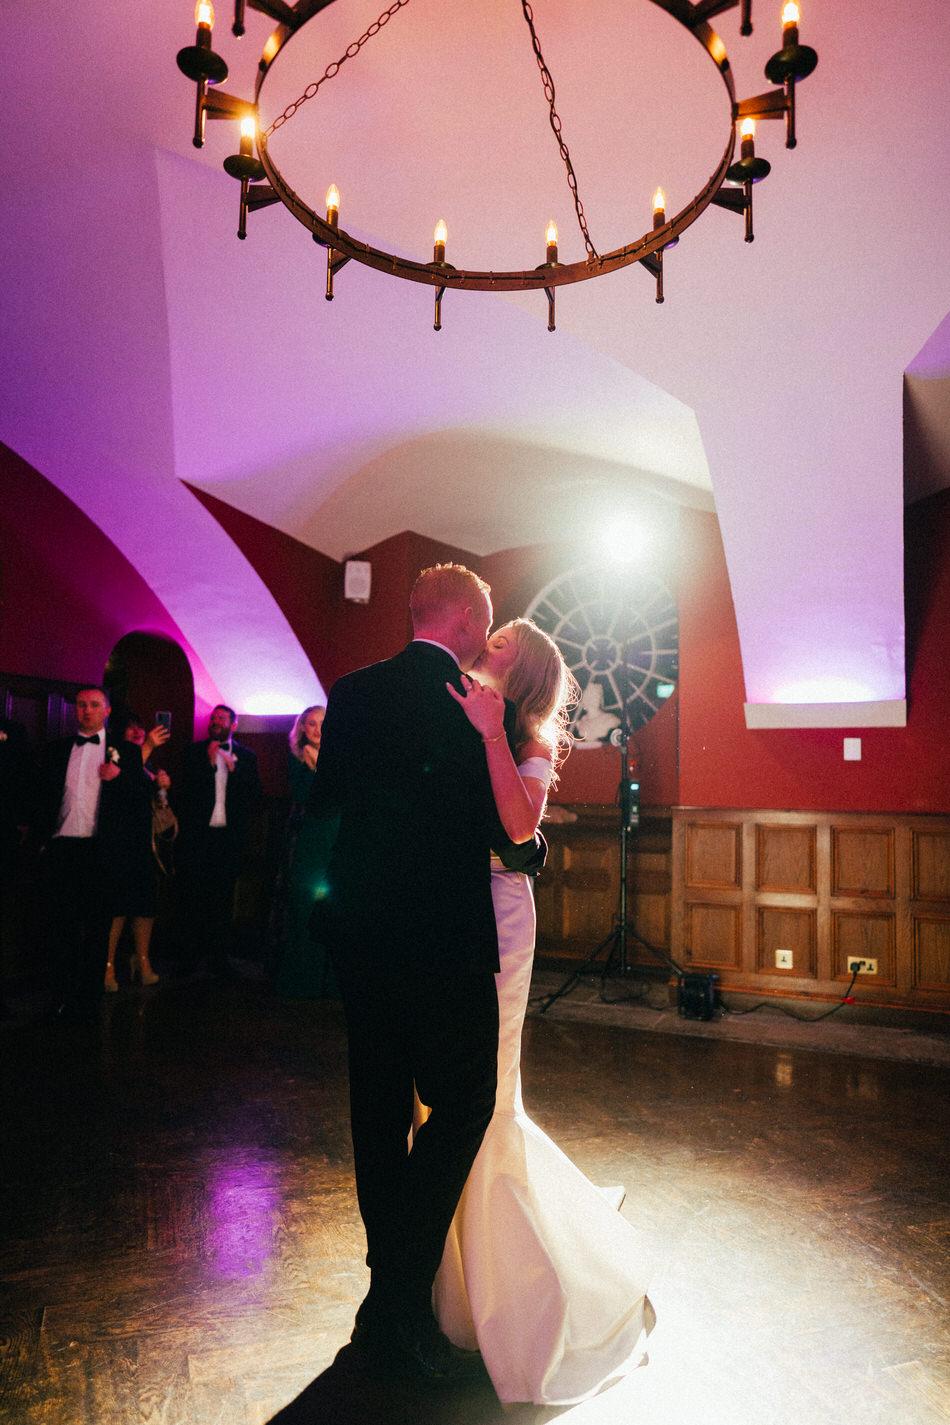 Castle-wedding-ireland-photos- 0322 236